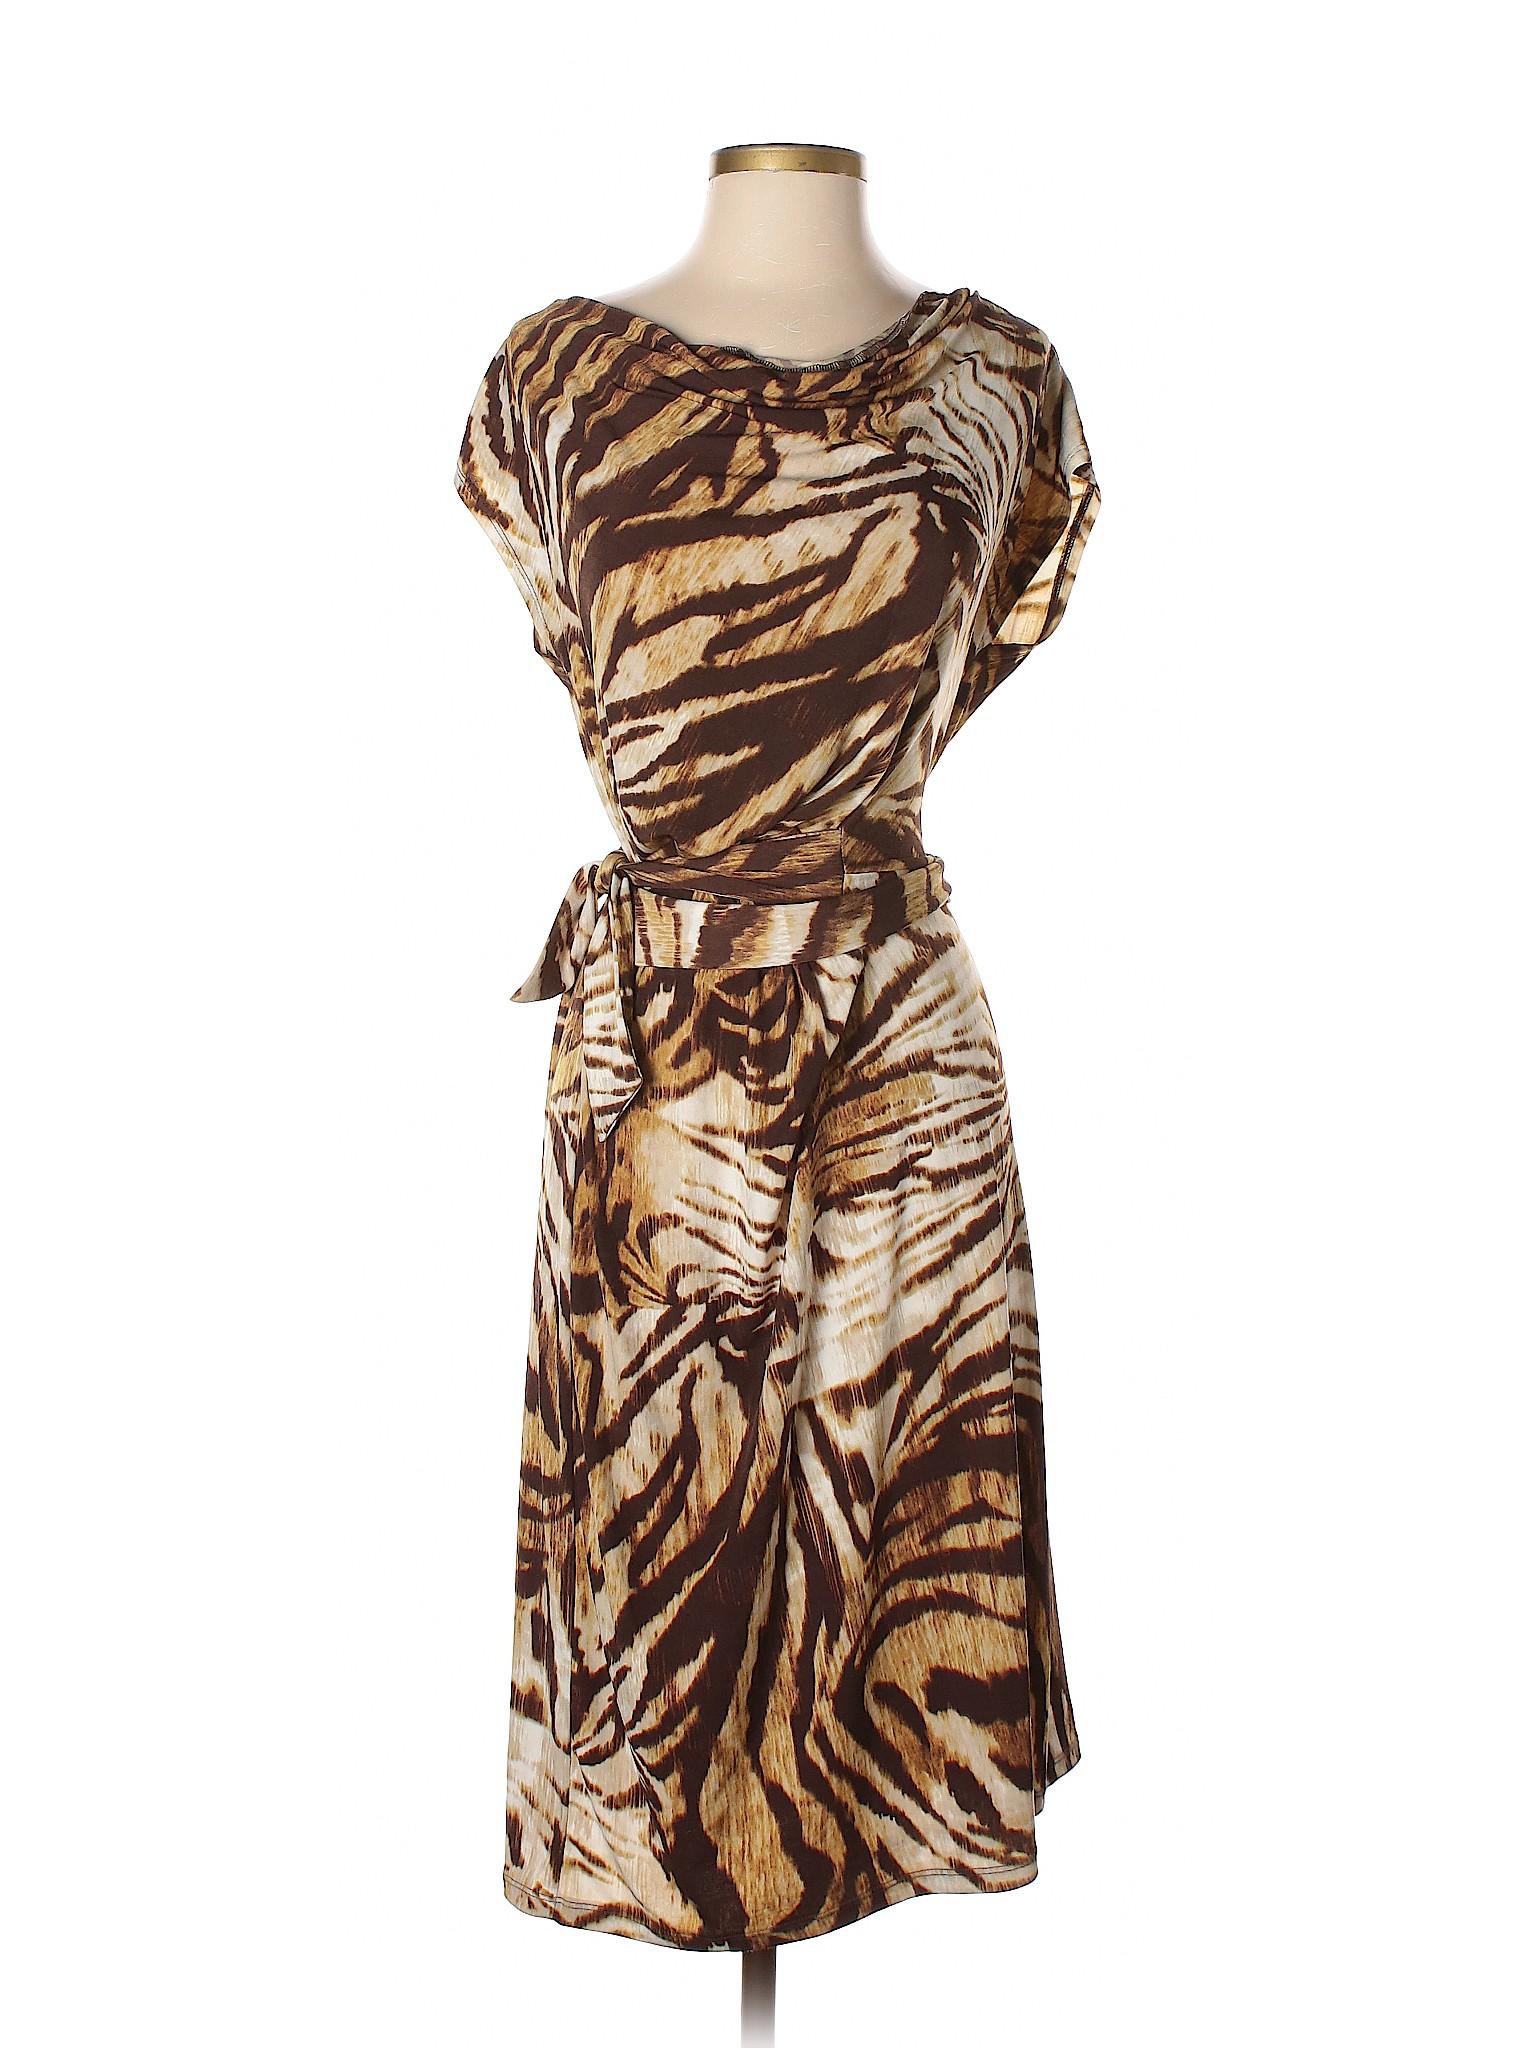 Boutique Casual Jones winter New York Dress rHfrqZ6